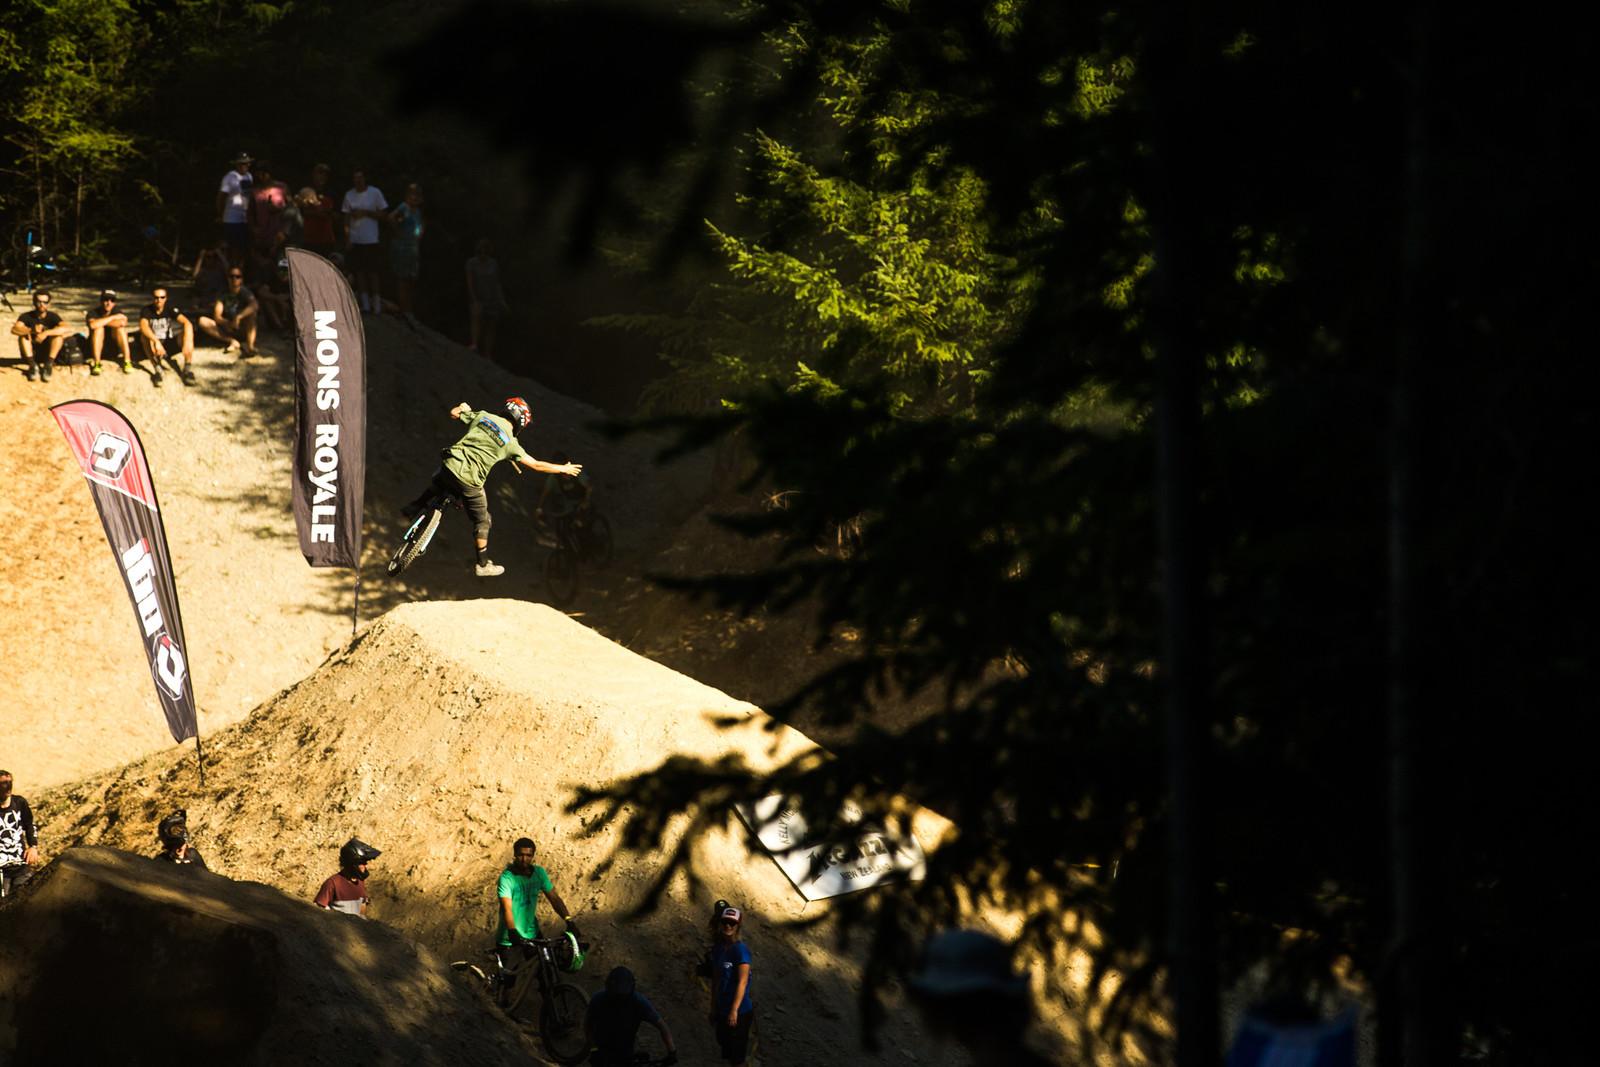 Laurie Greenland - McGazza Fest Dream Track Jam - Mountain Biking Pictures - Vital MTB